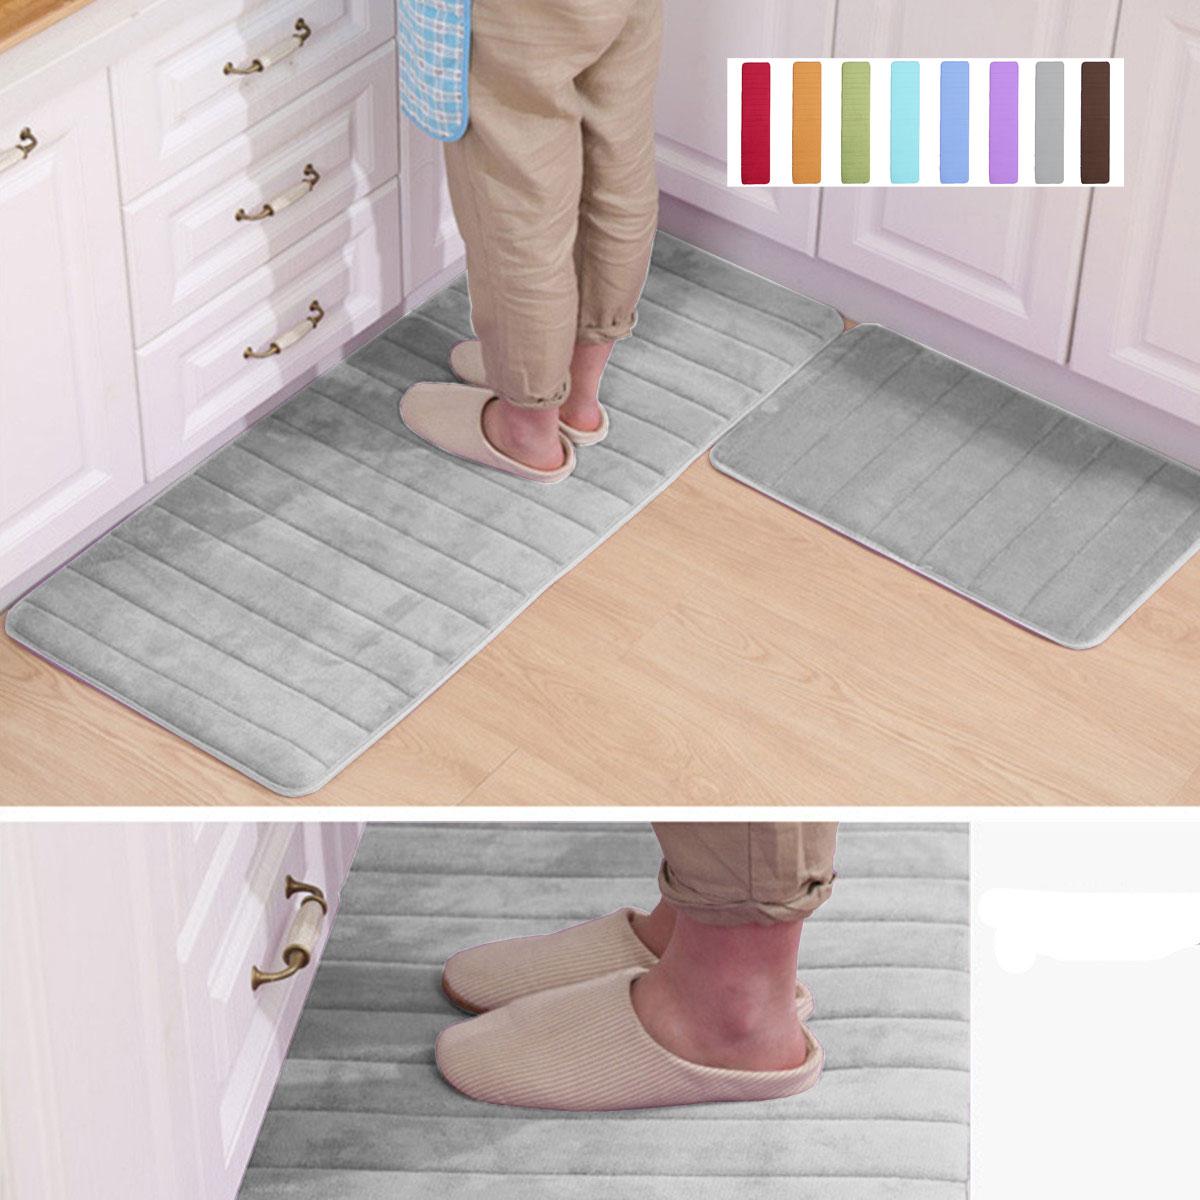 20 x30 62 x20 memory foam mat absorbent slip resistant on farmhouse colors for bath mats walmart id=87623